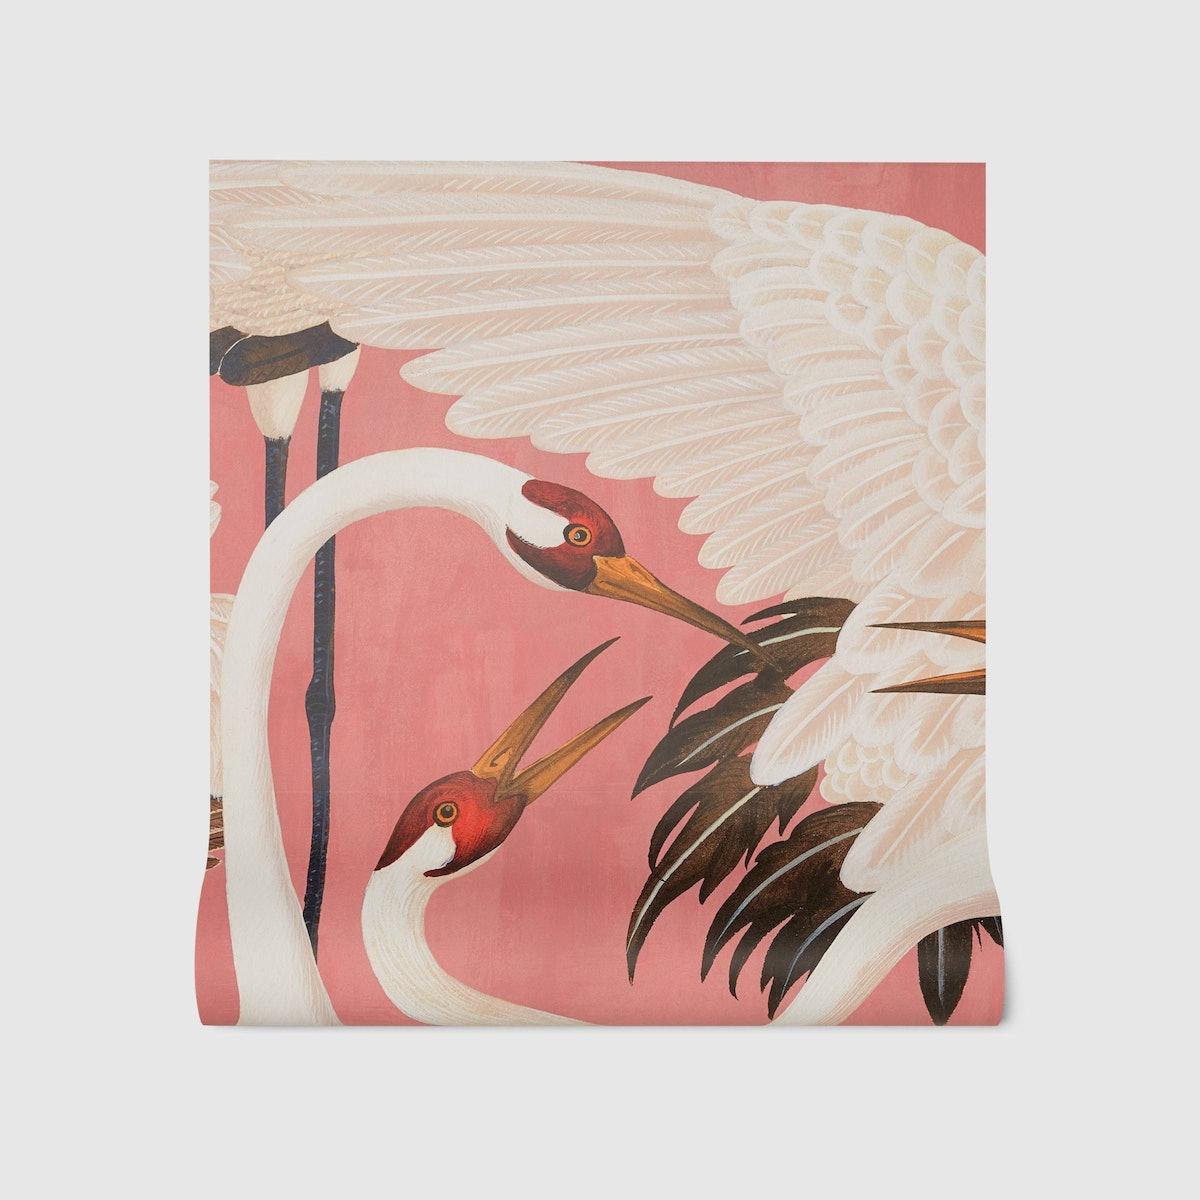 Heron Print Wallpaper (2 panels, W2.25ft x H11.5ft)